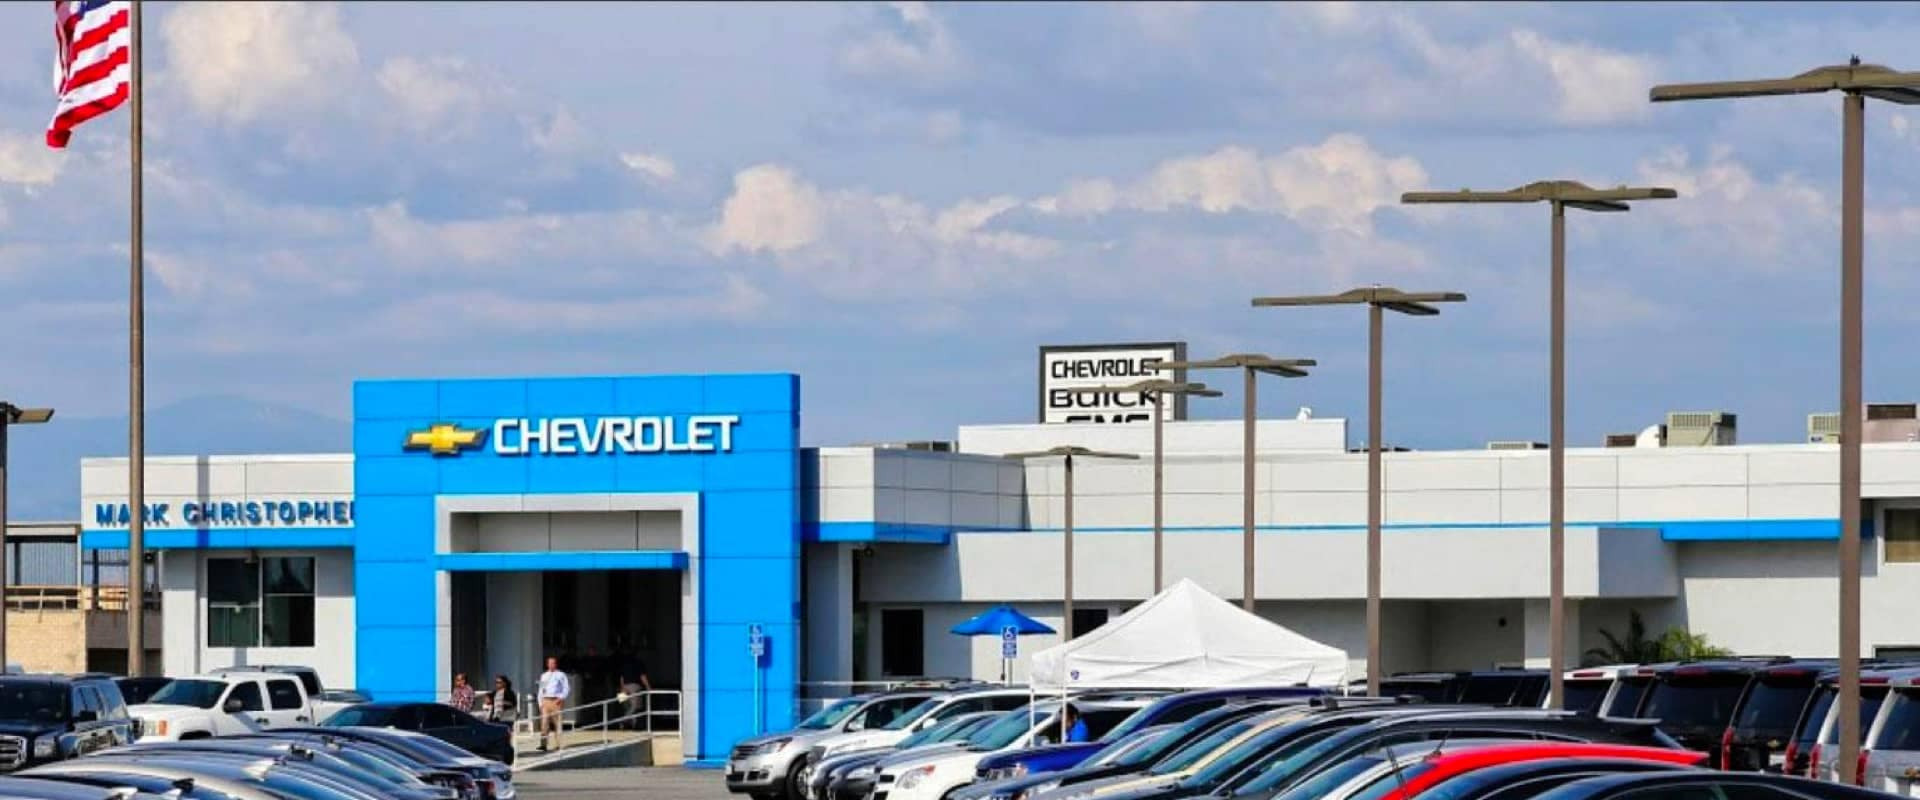 Mark Christopher Auto Center dealership